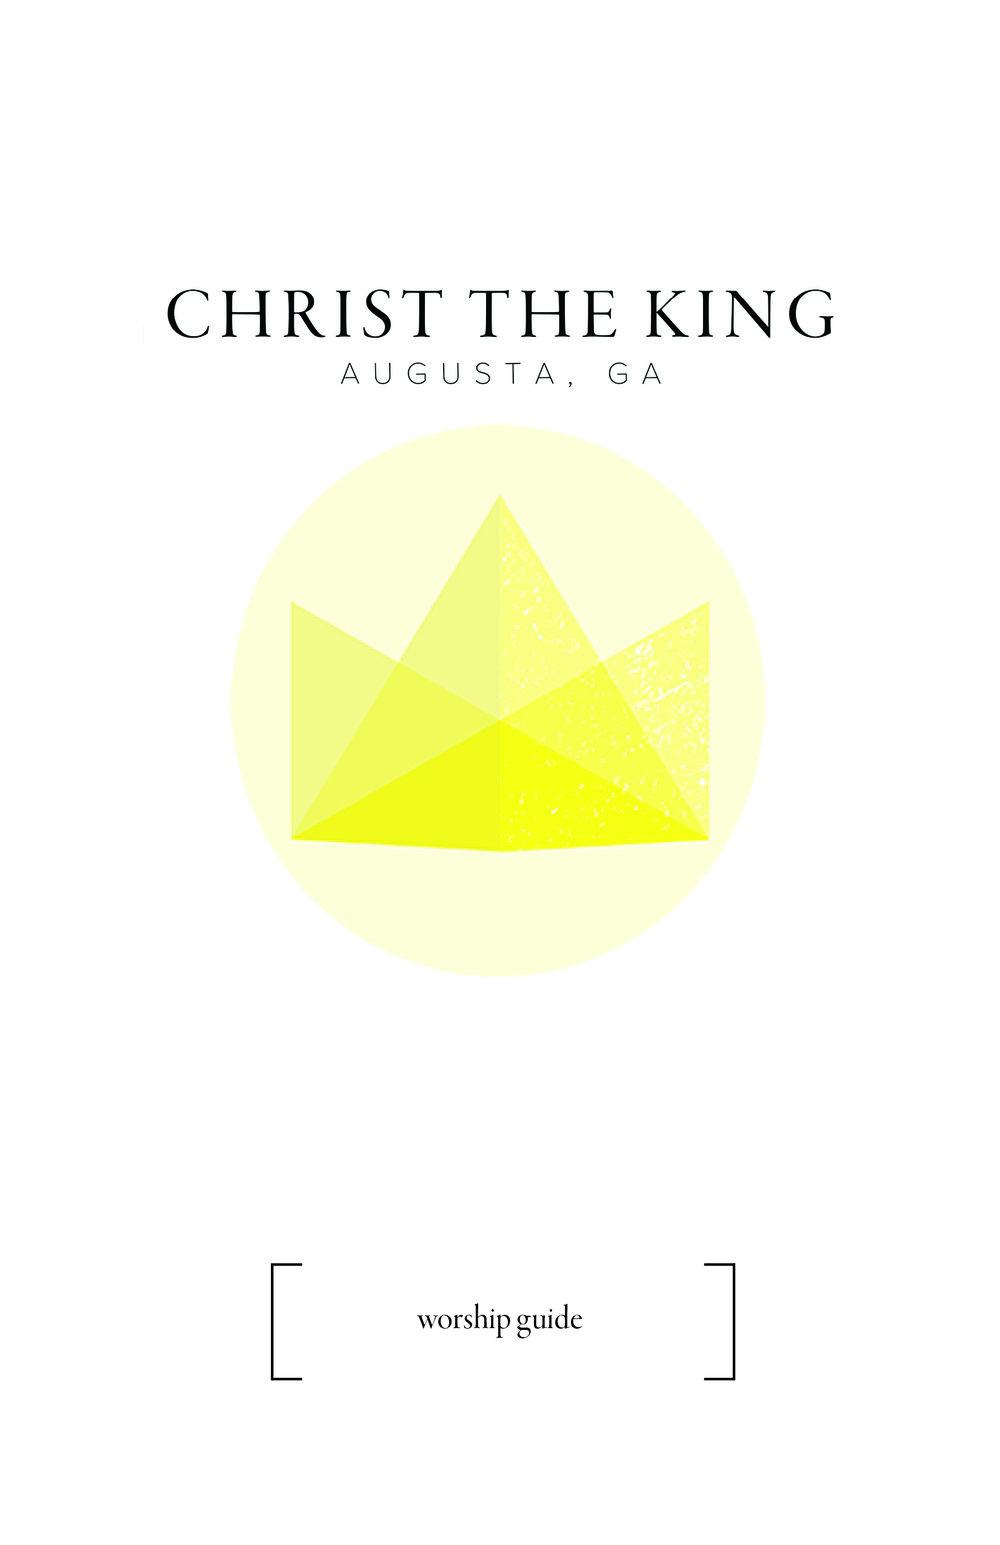 081218 ctk worship guide.jpg